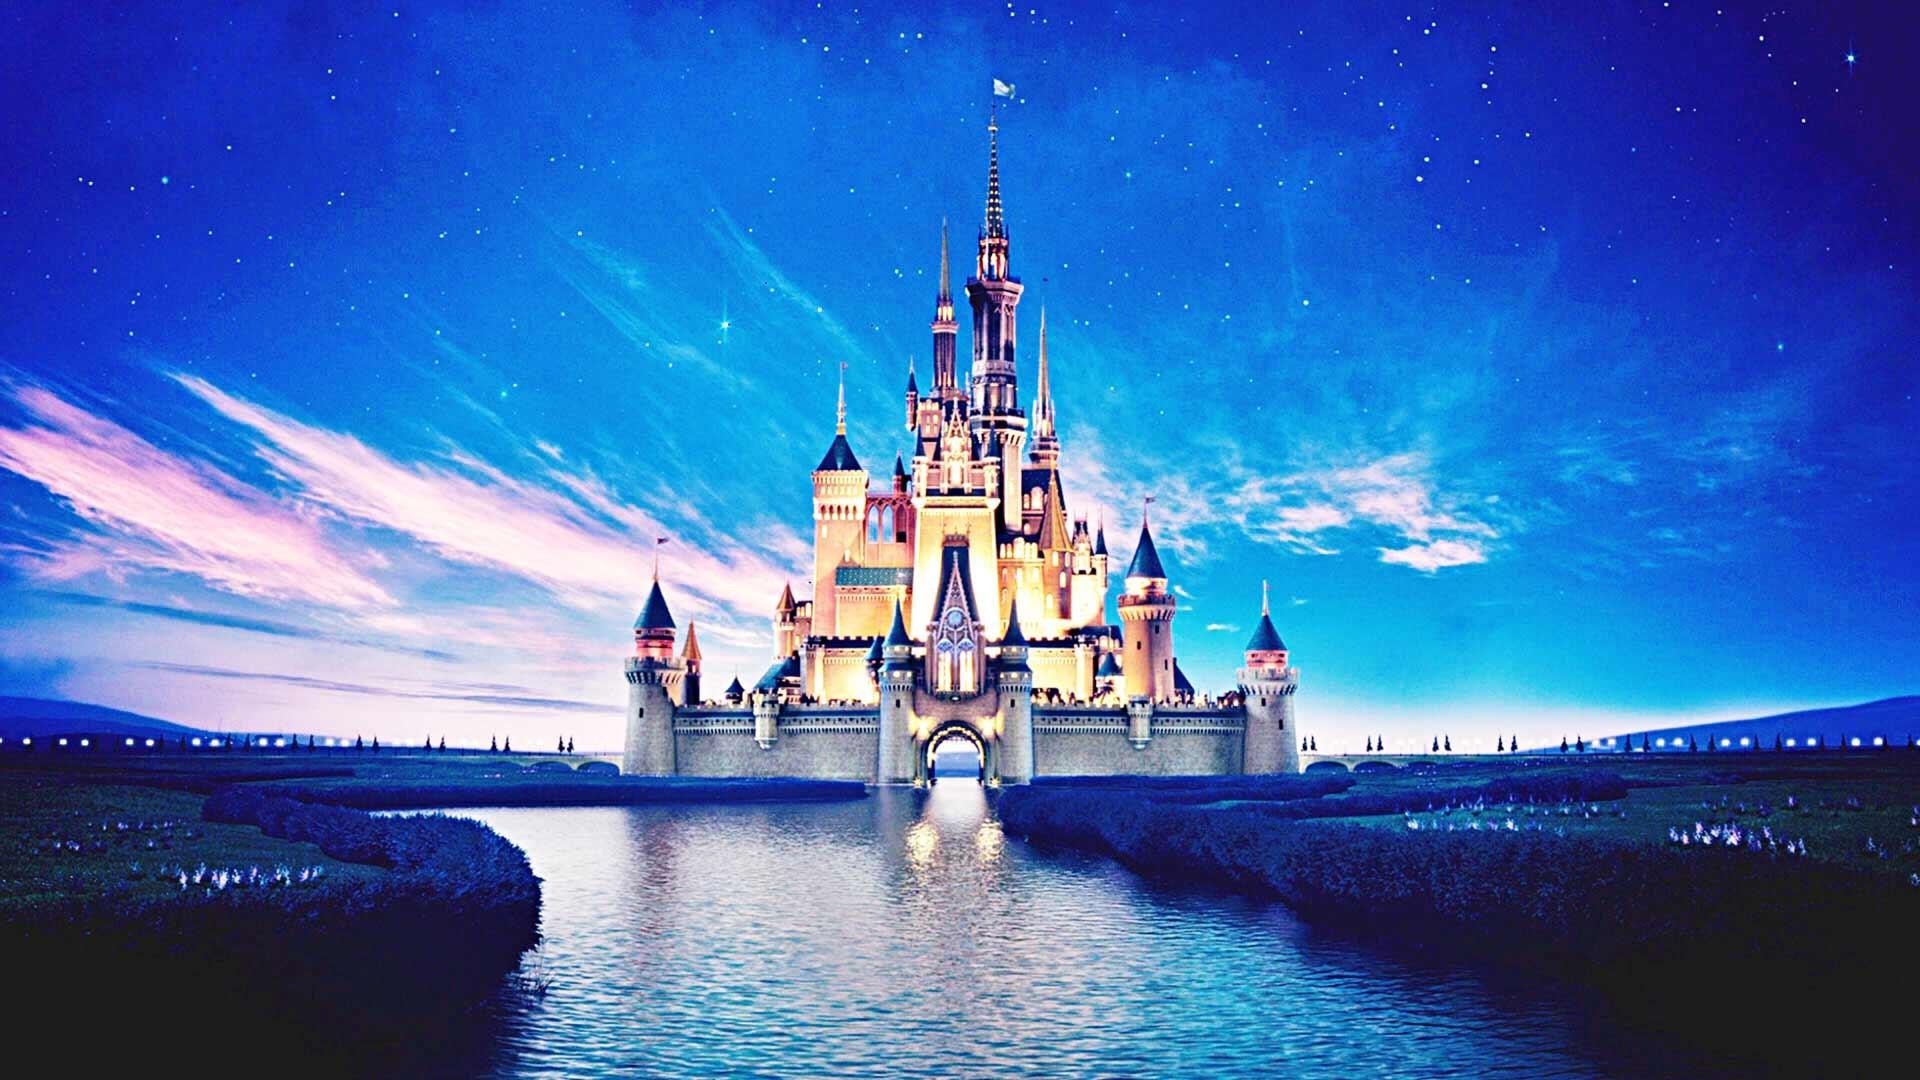 Top Wallpaper Mac Disney - 284817-top-disney-wallpaper-1920x1080-for-phone  Best Photo Reference_49468.jpg